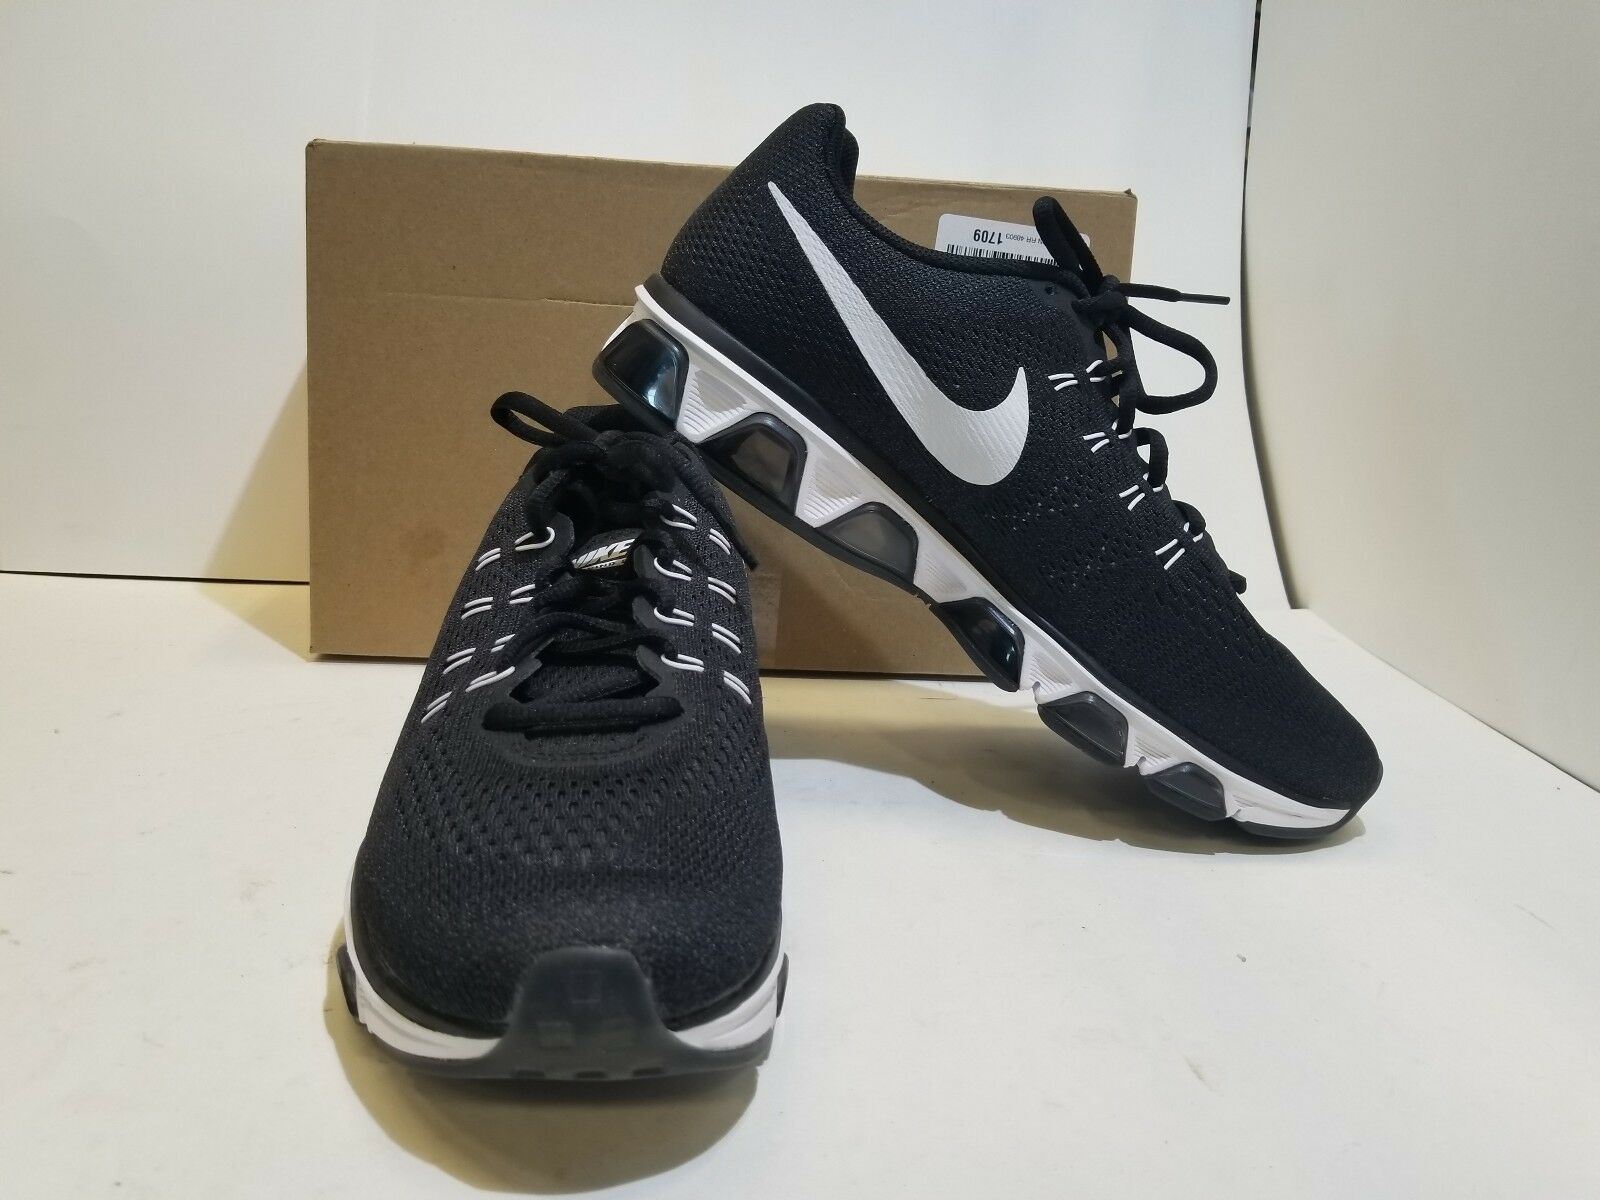 Nike Air Max Trailwind 8 donna US 11.5 nero 805942